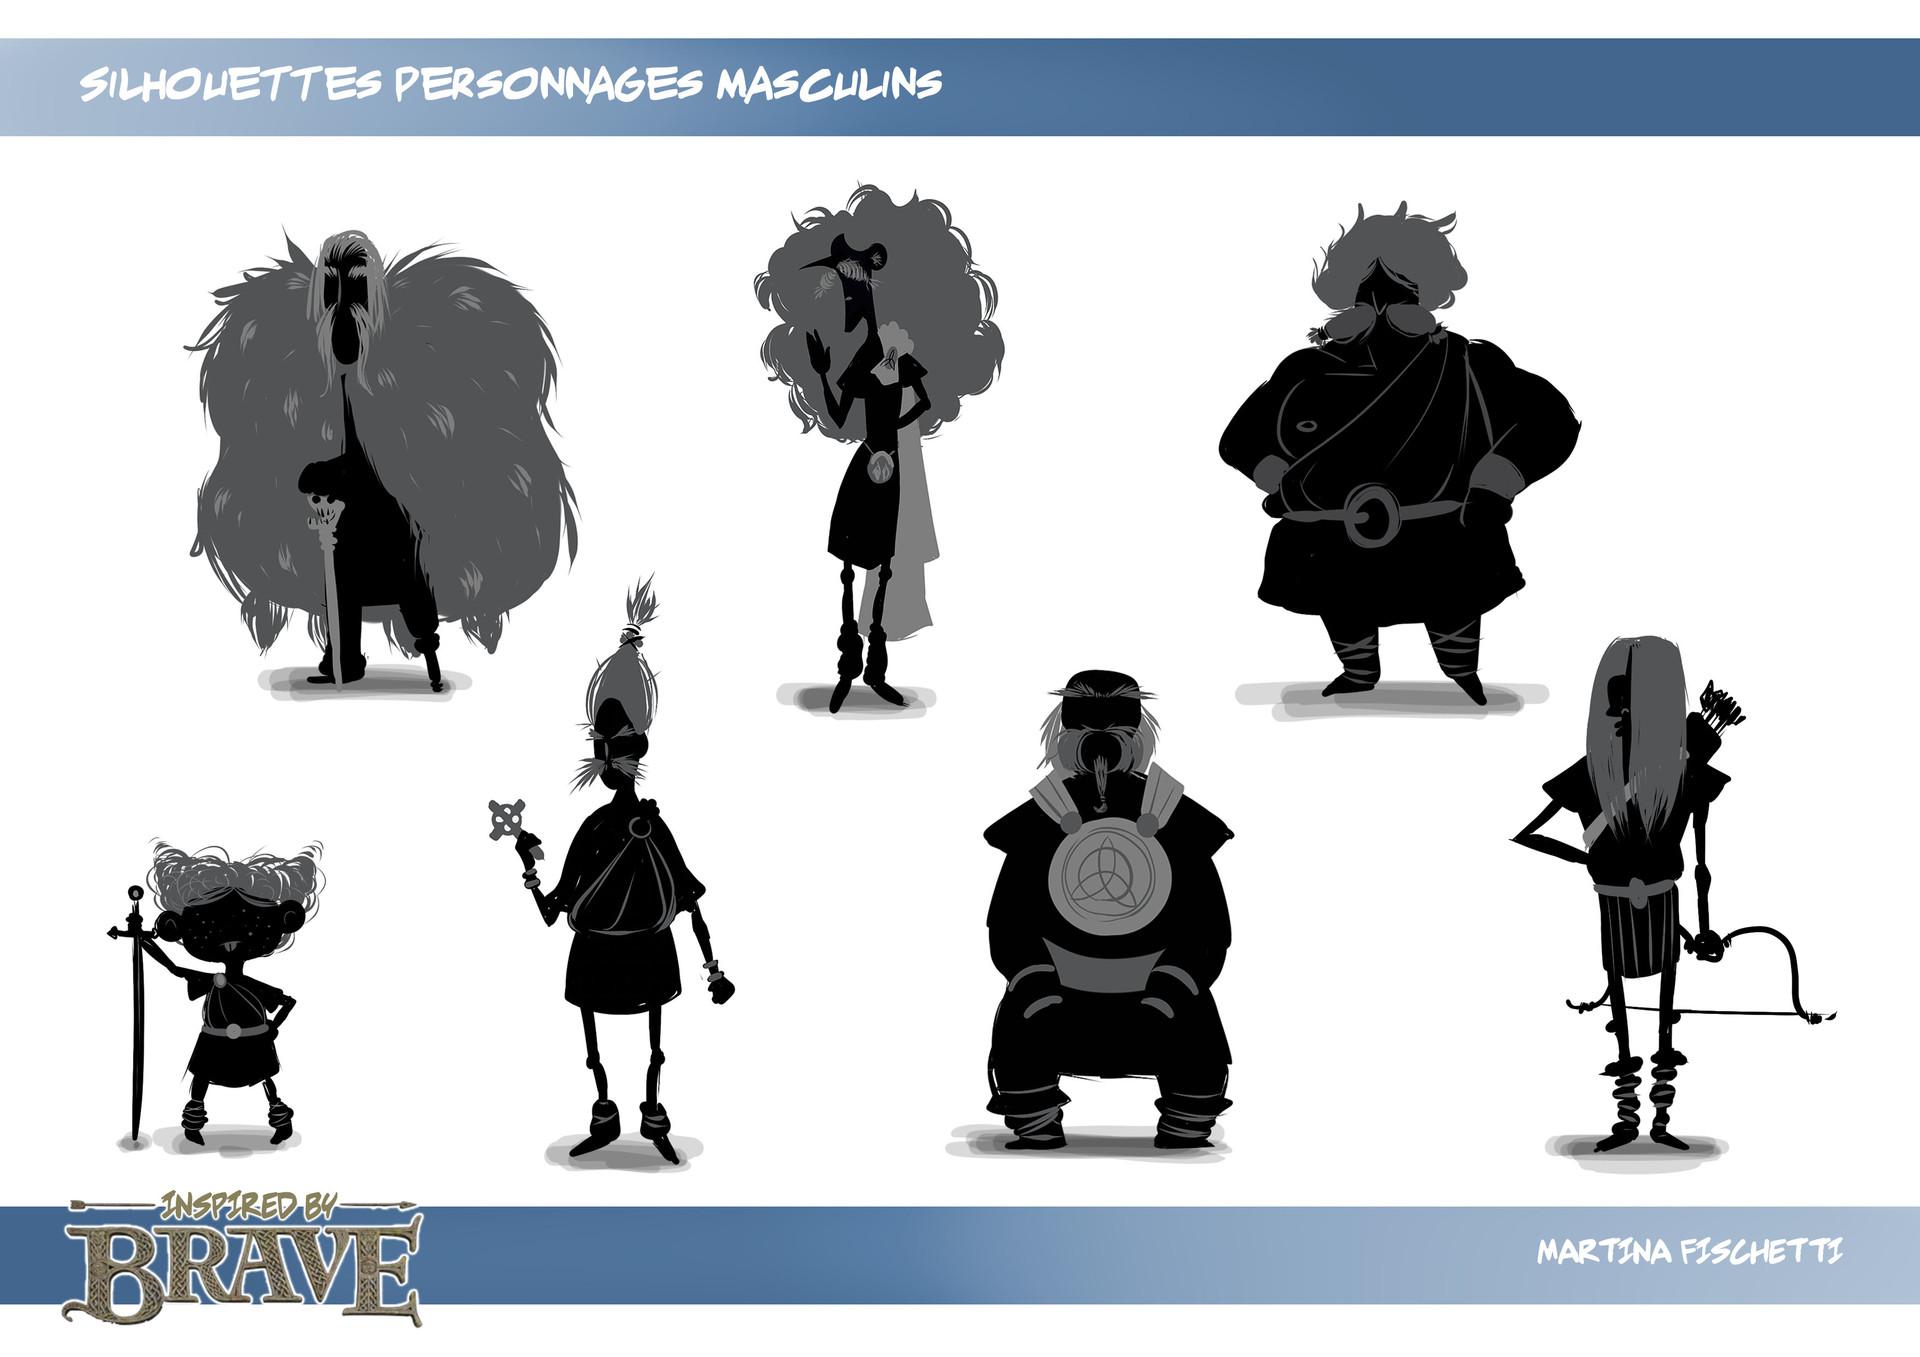 Martina fischetti 04 brave silhouettes hommes